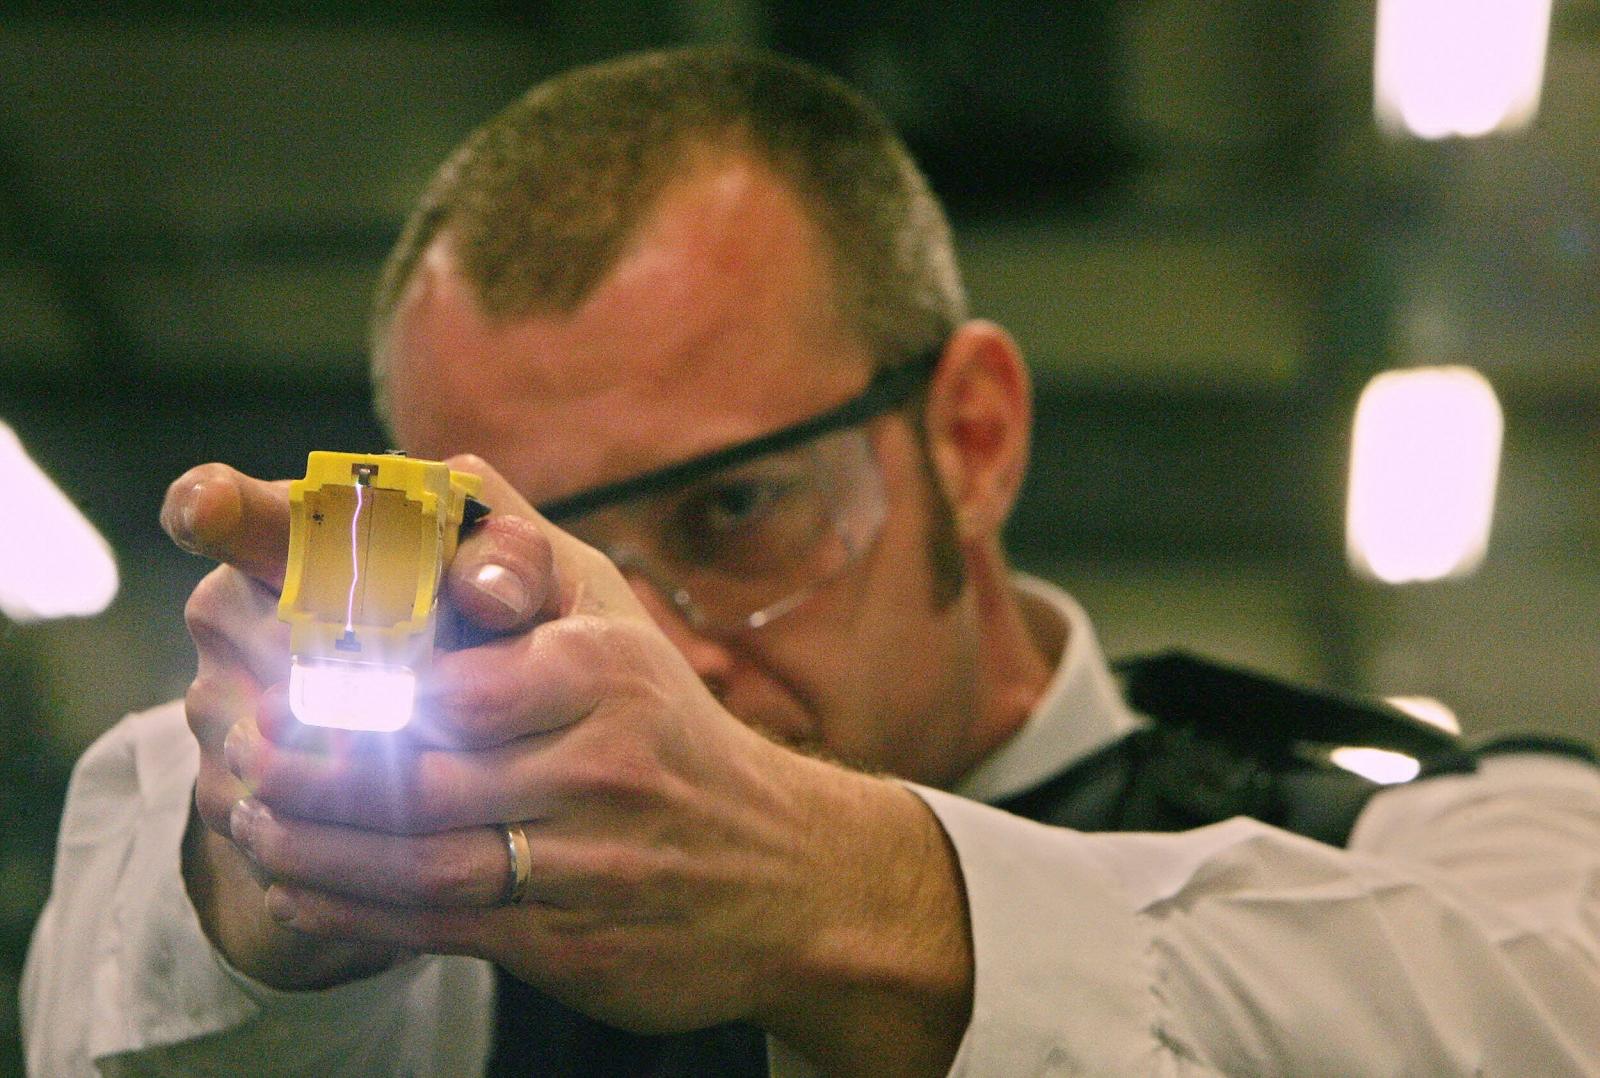 Taser use London police